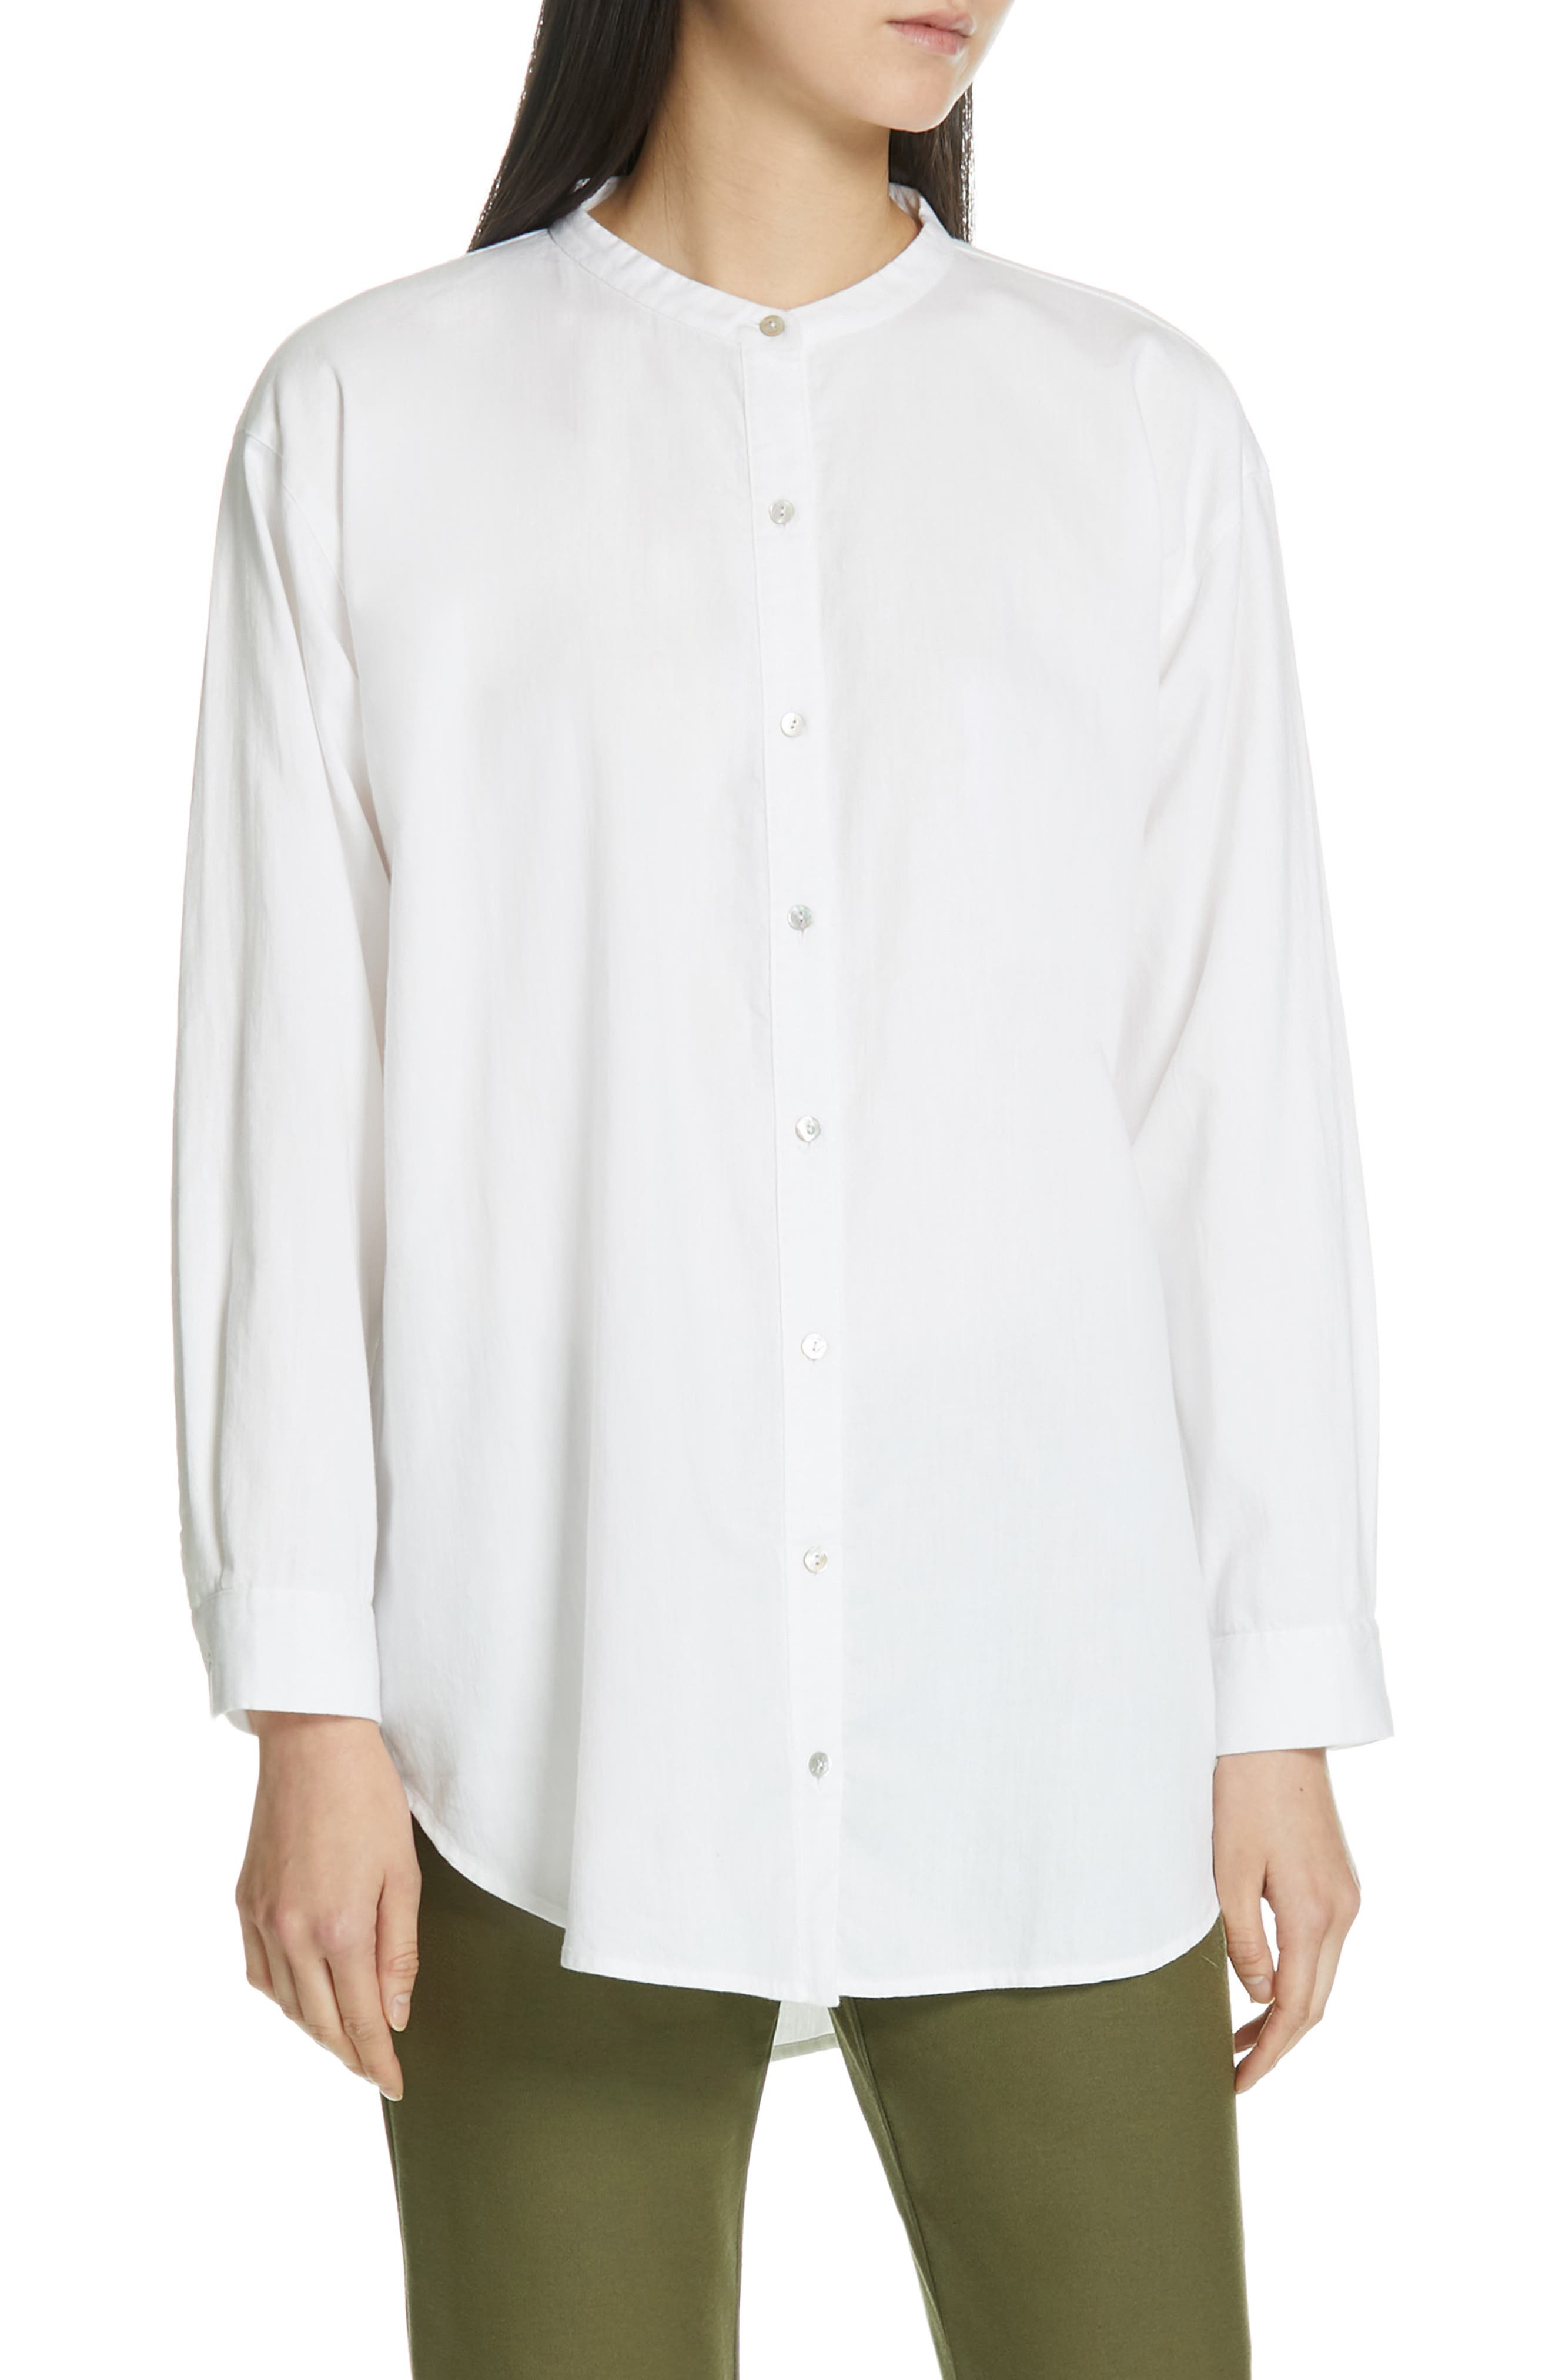 Eileen Fisher Mandarin Collar Organic Cotton Tunic Shirt, Ivory